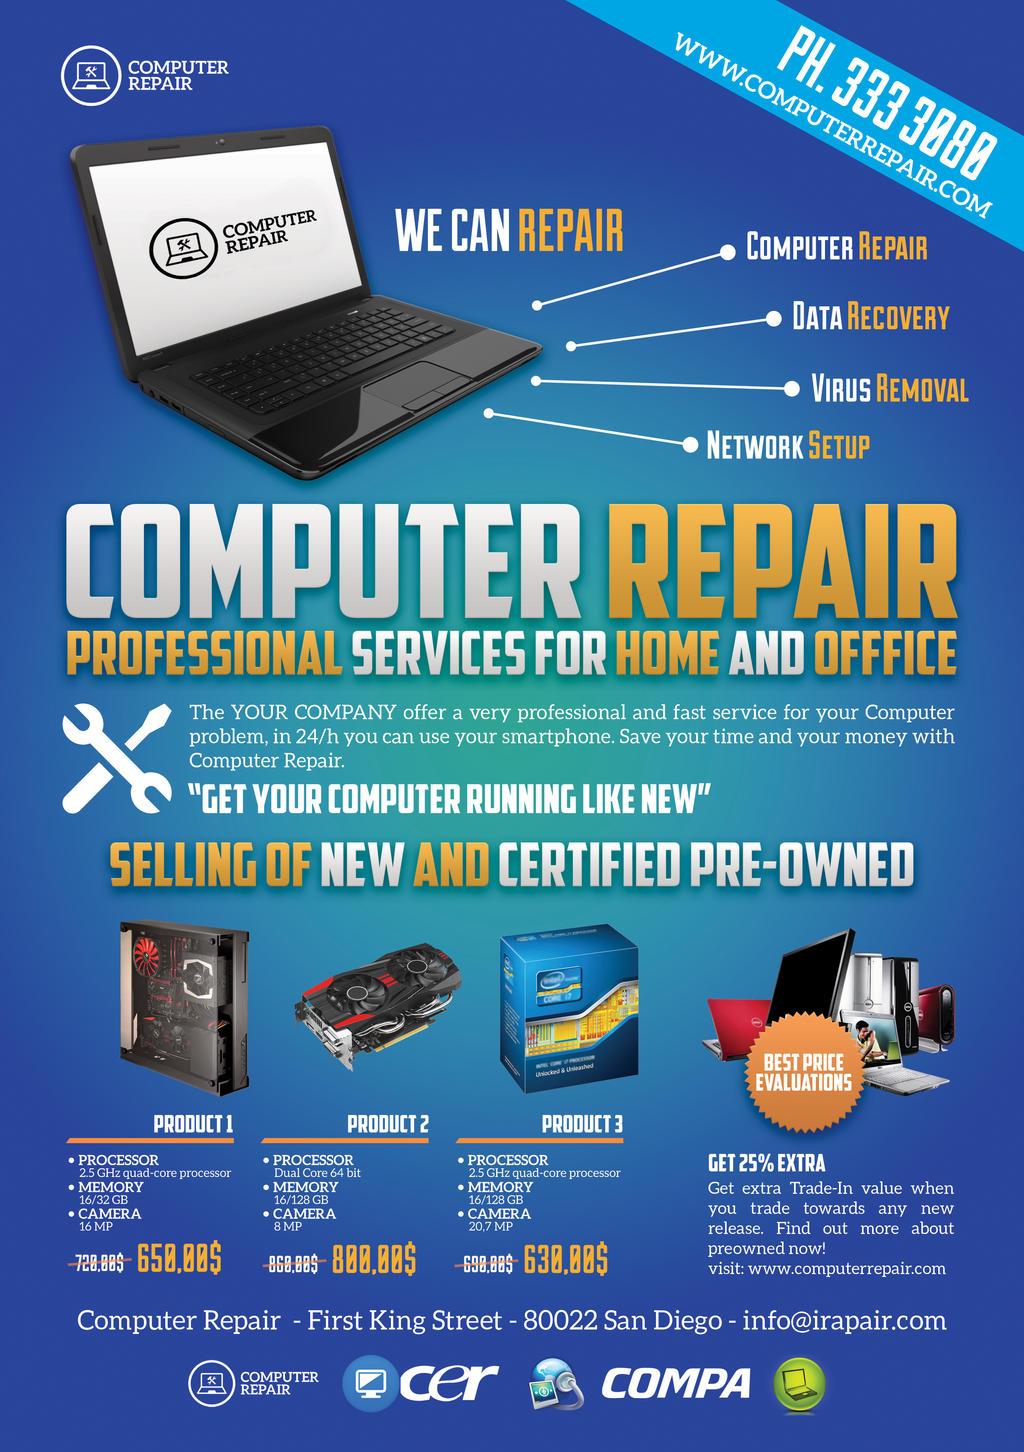 Computer Repair Flyer/Poster by Giunina on DeviantArt